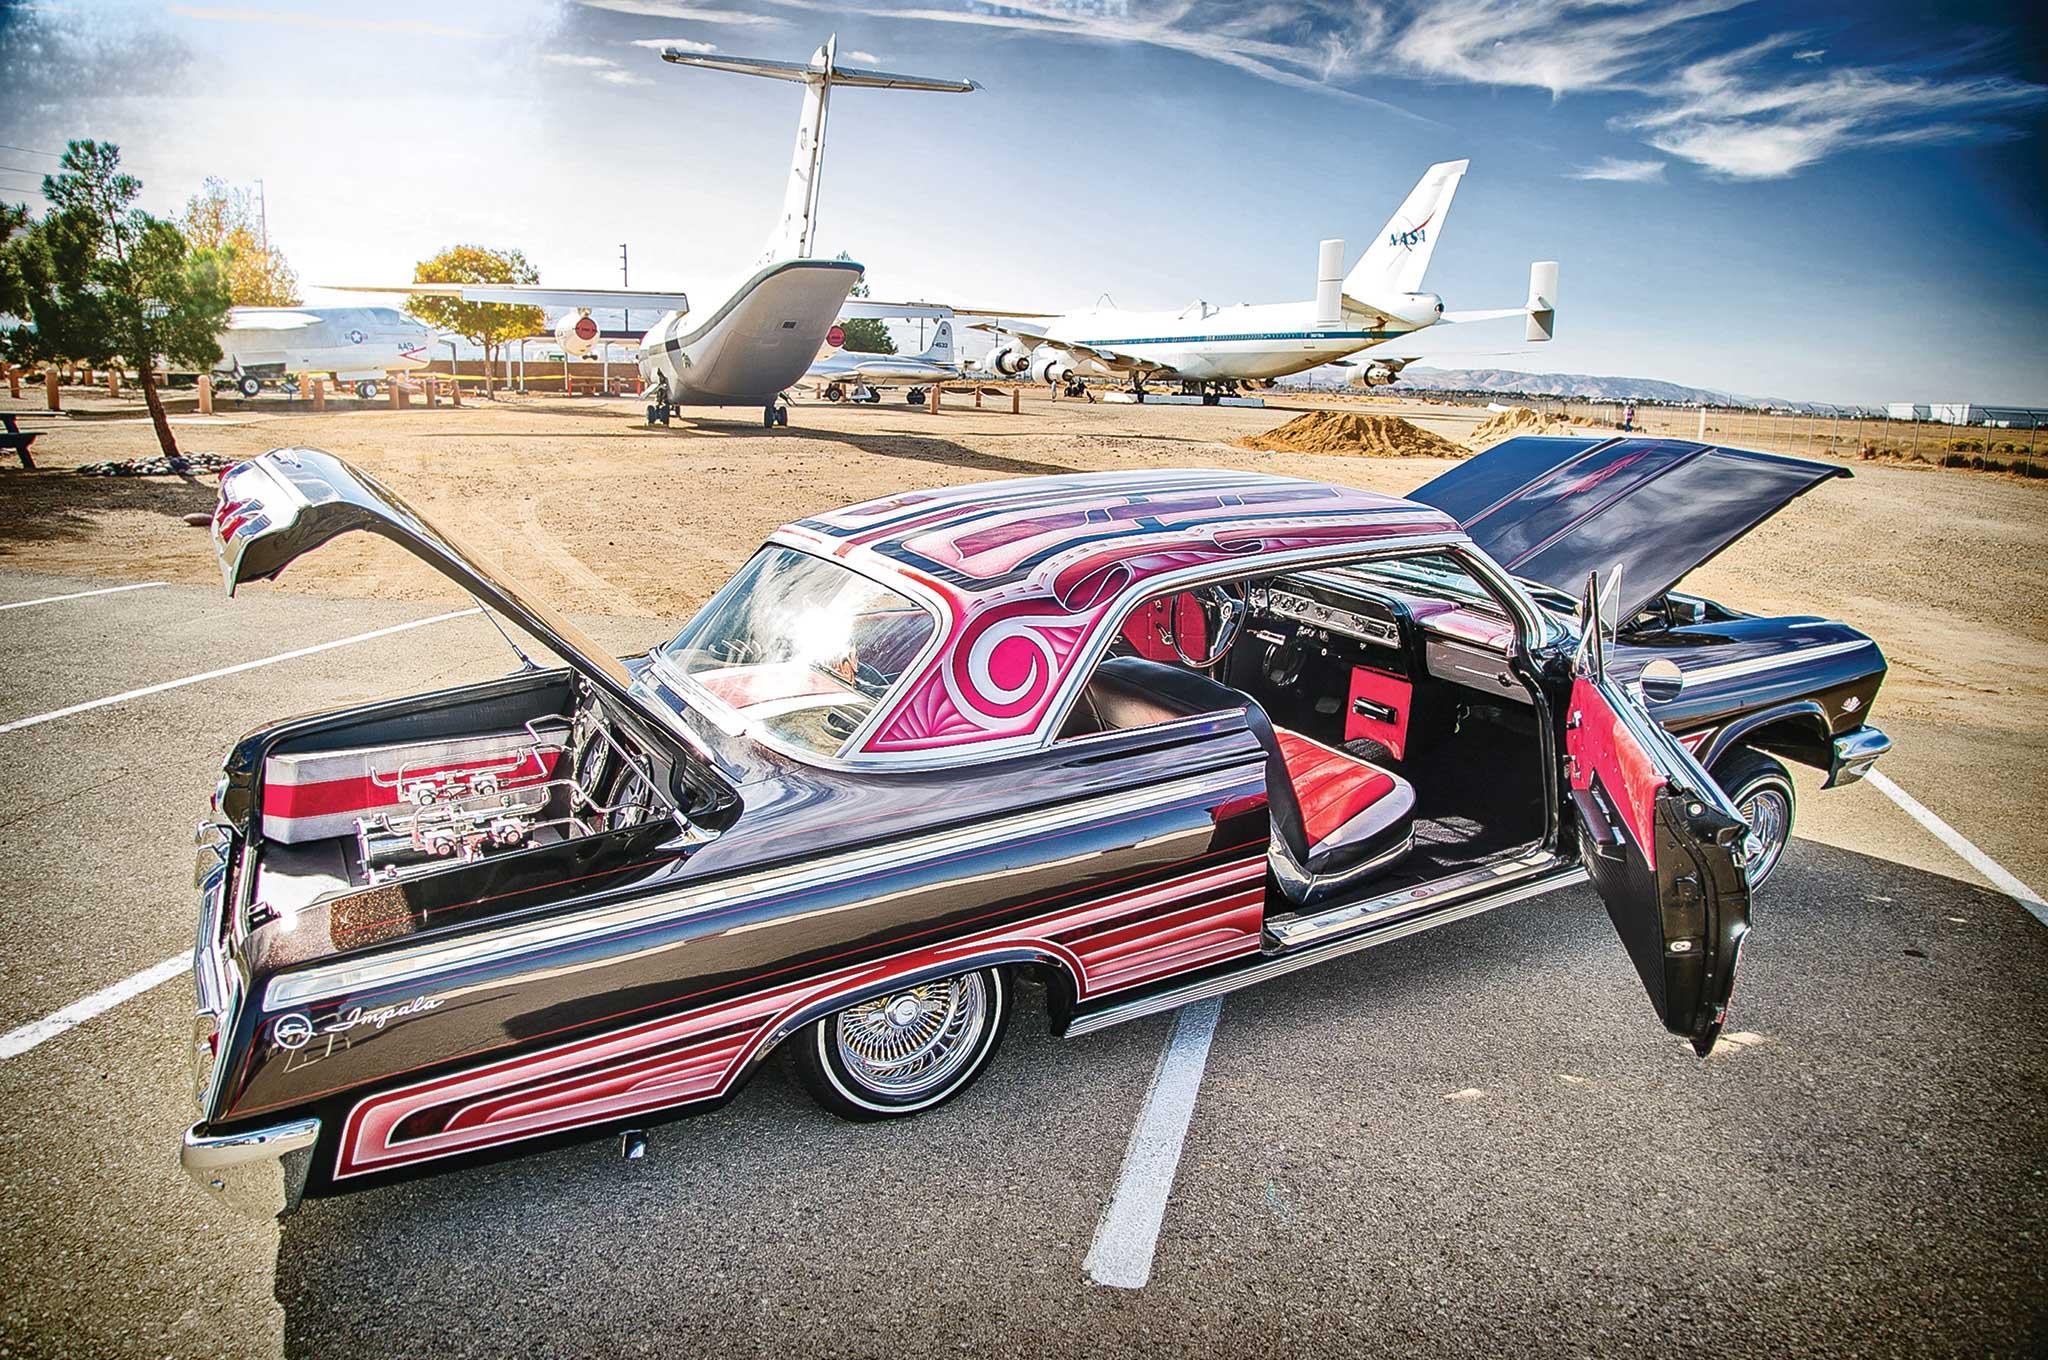 1962 chevrolet impala passenger side view 002